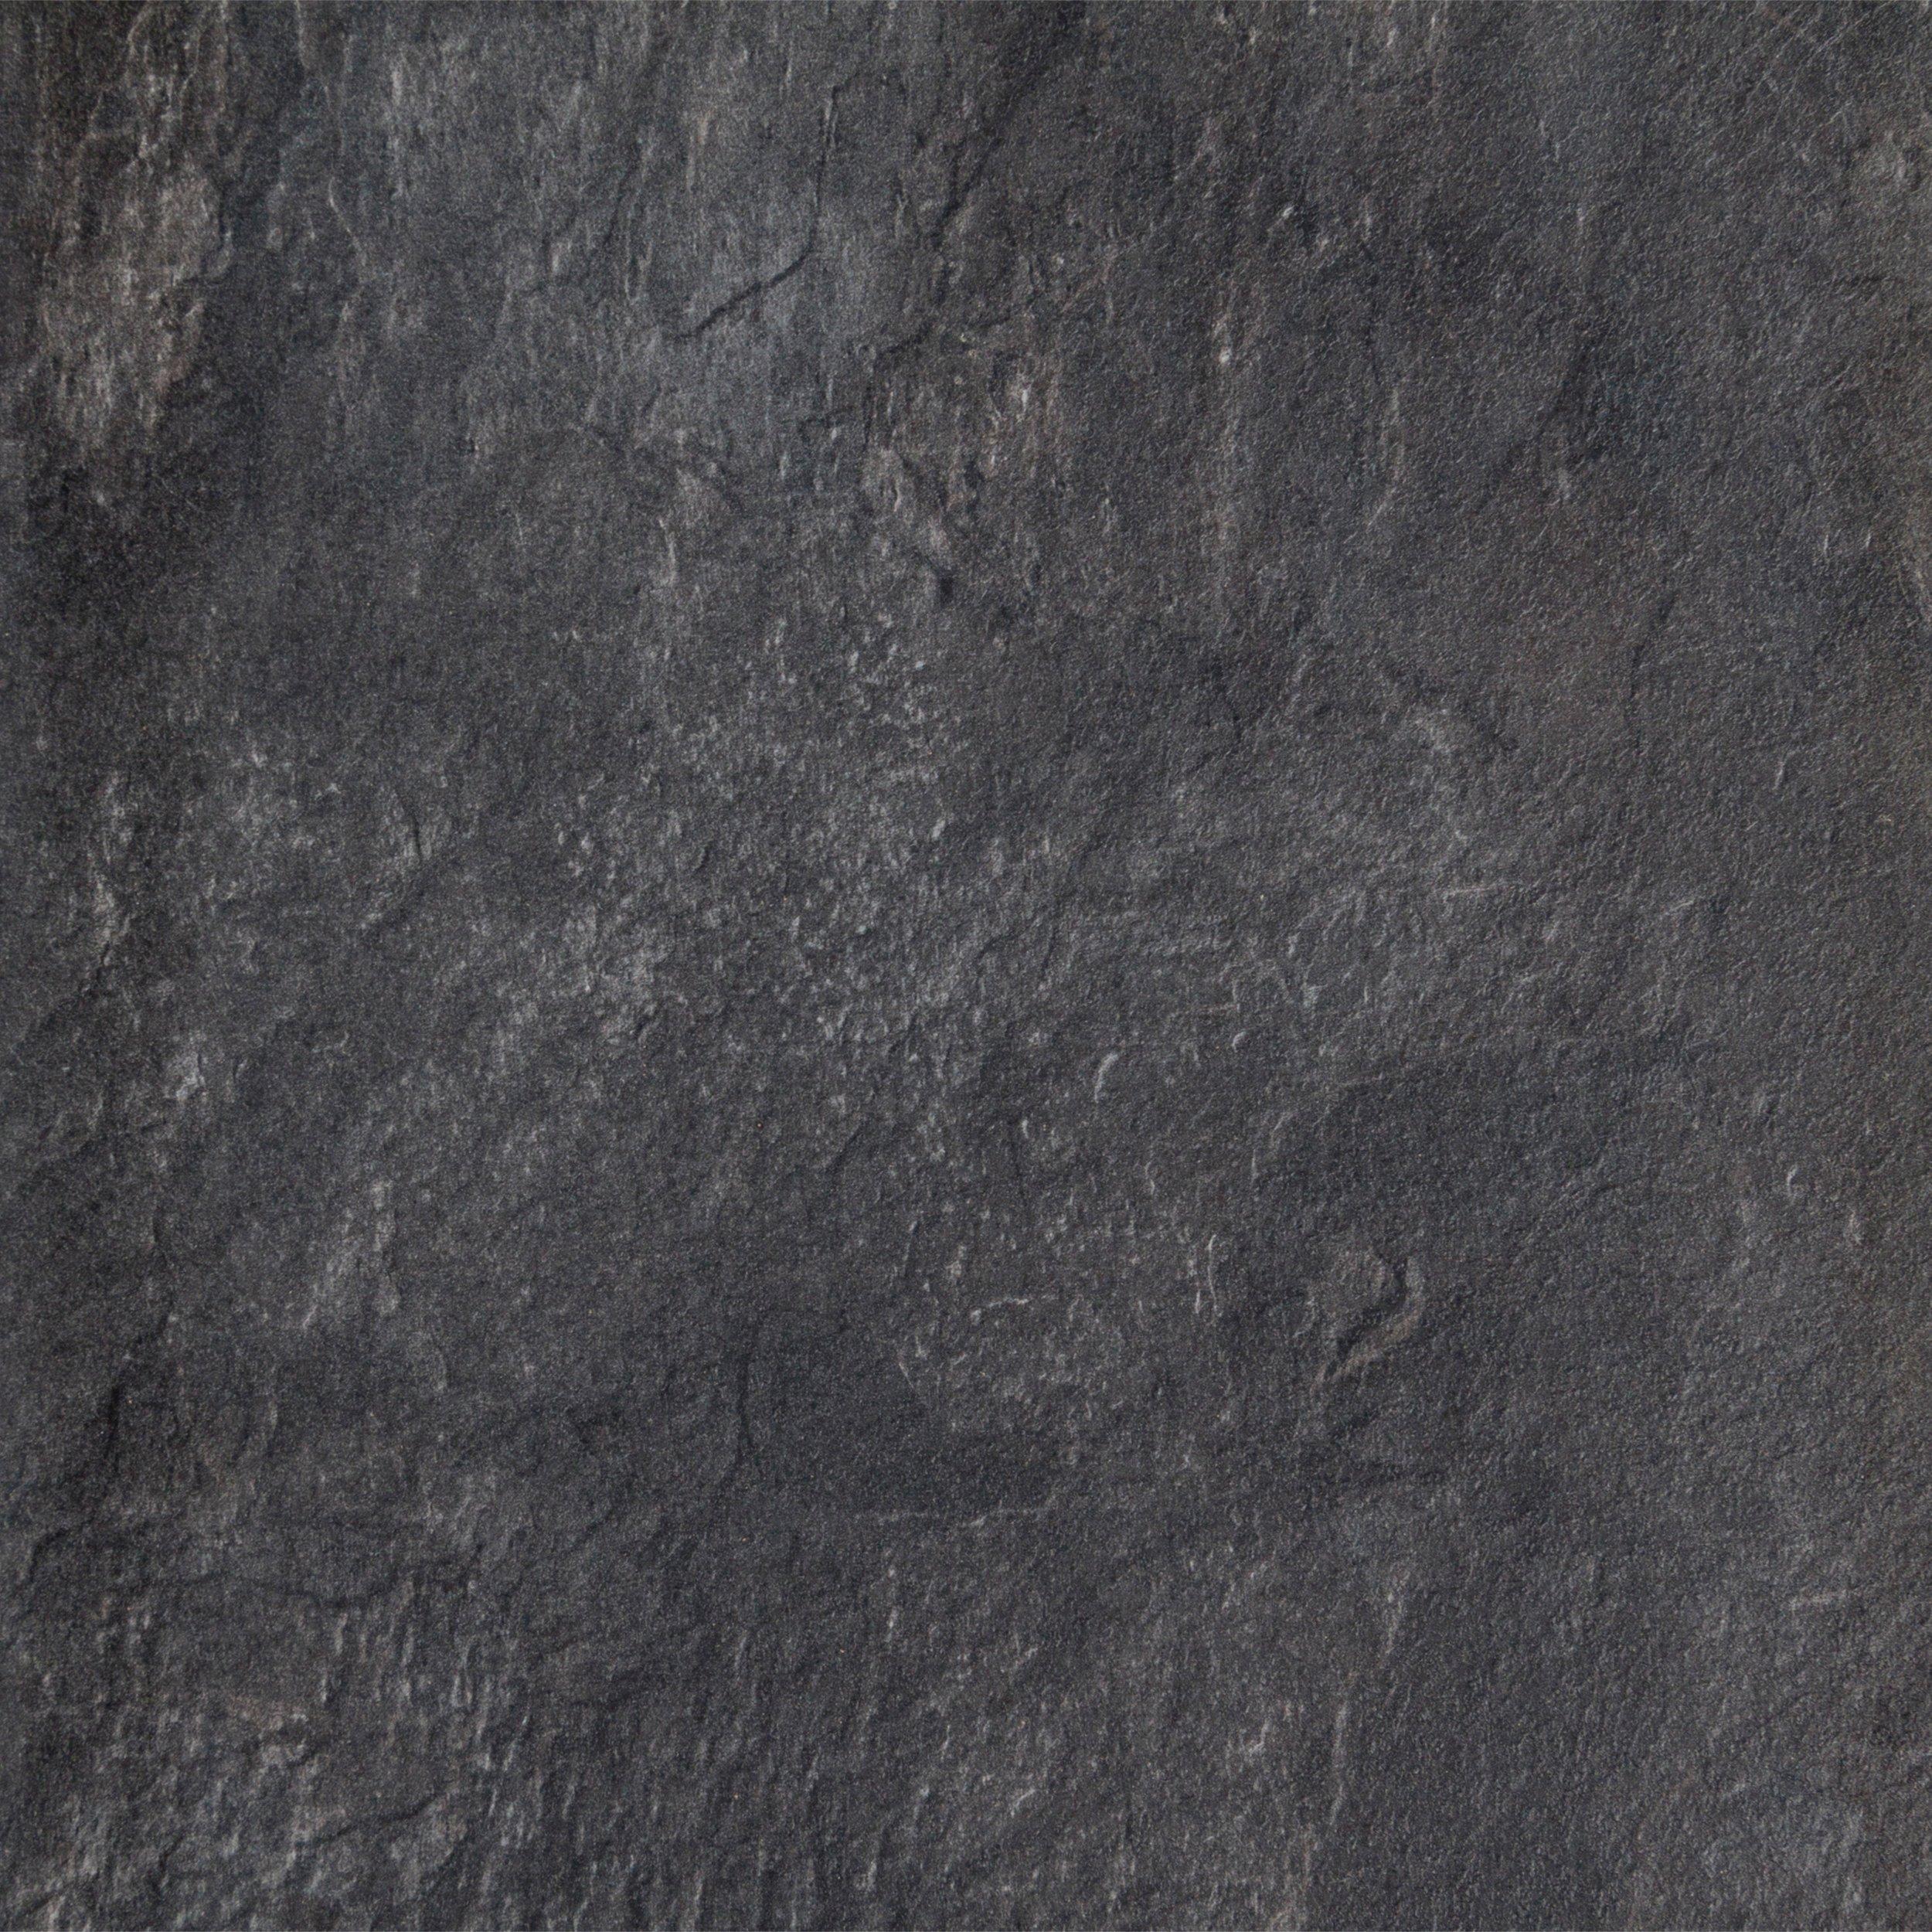 laminate stone flooring opal stone laminate - 8mm - 944101160   floor and decor QSYJWGR